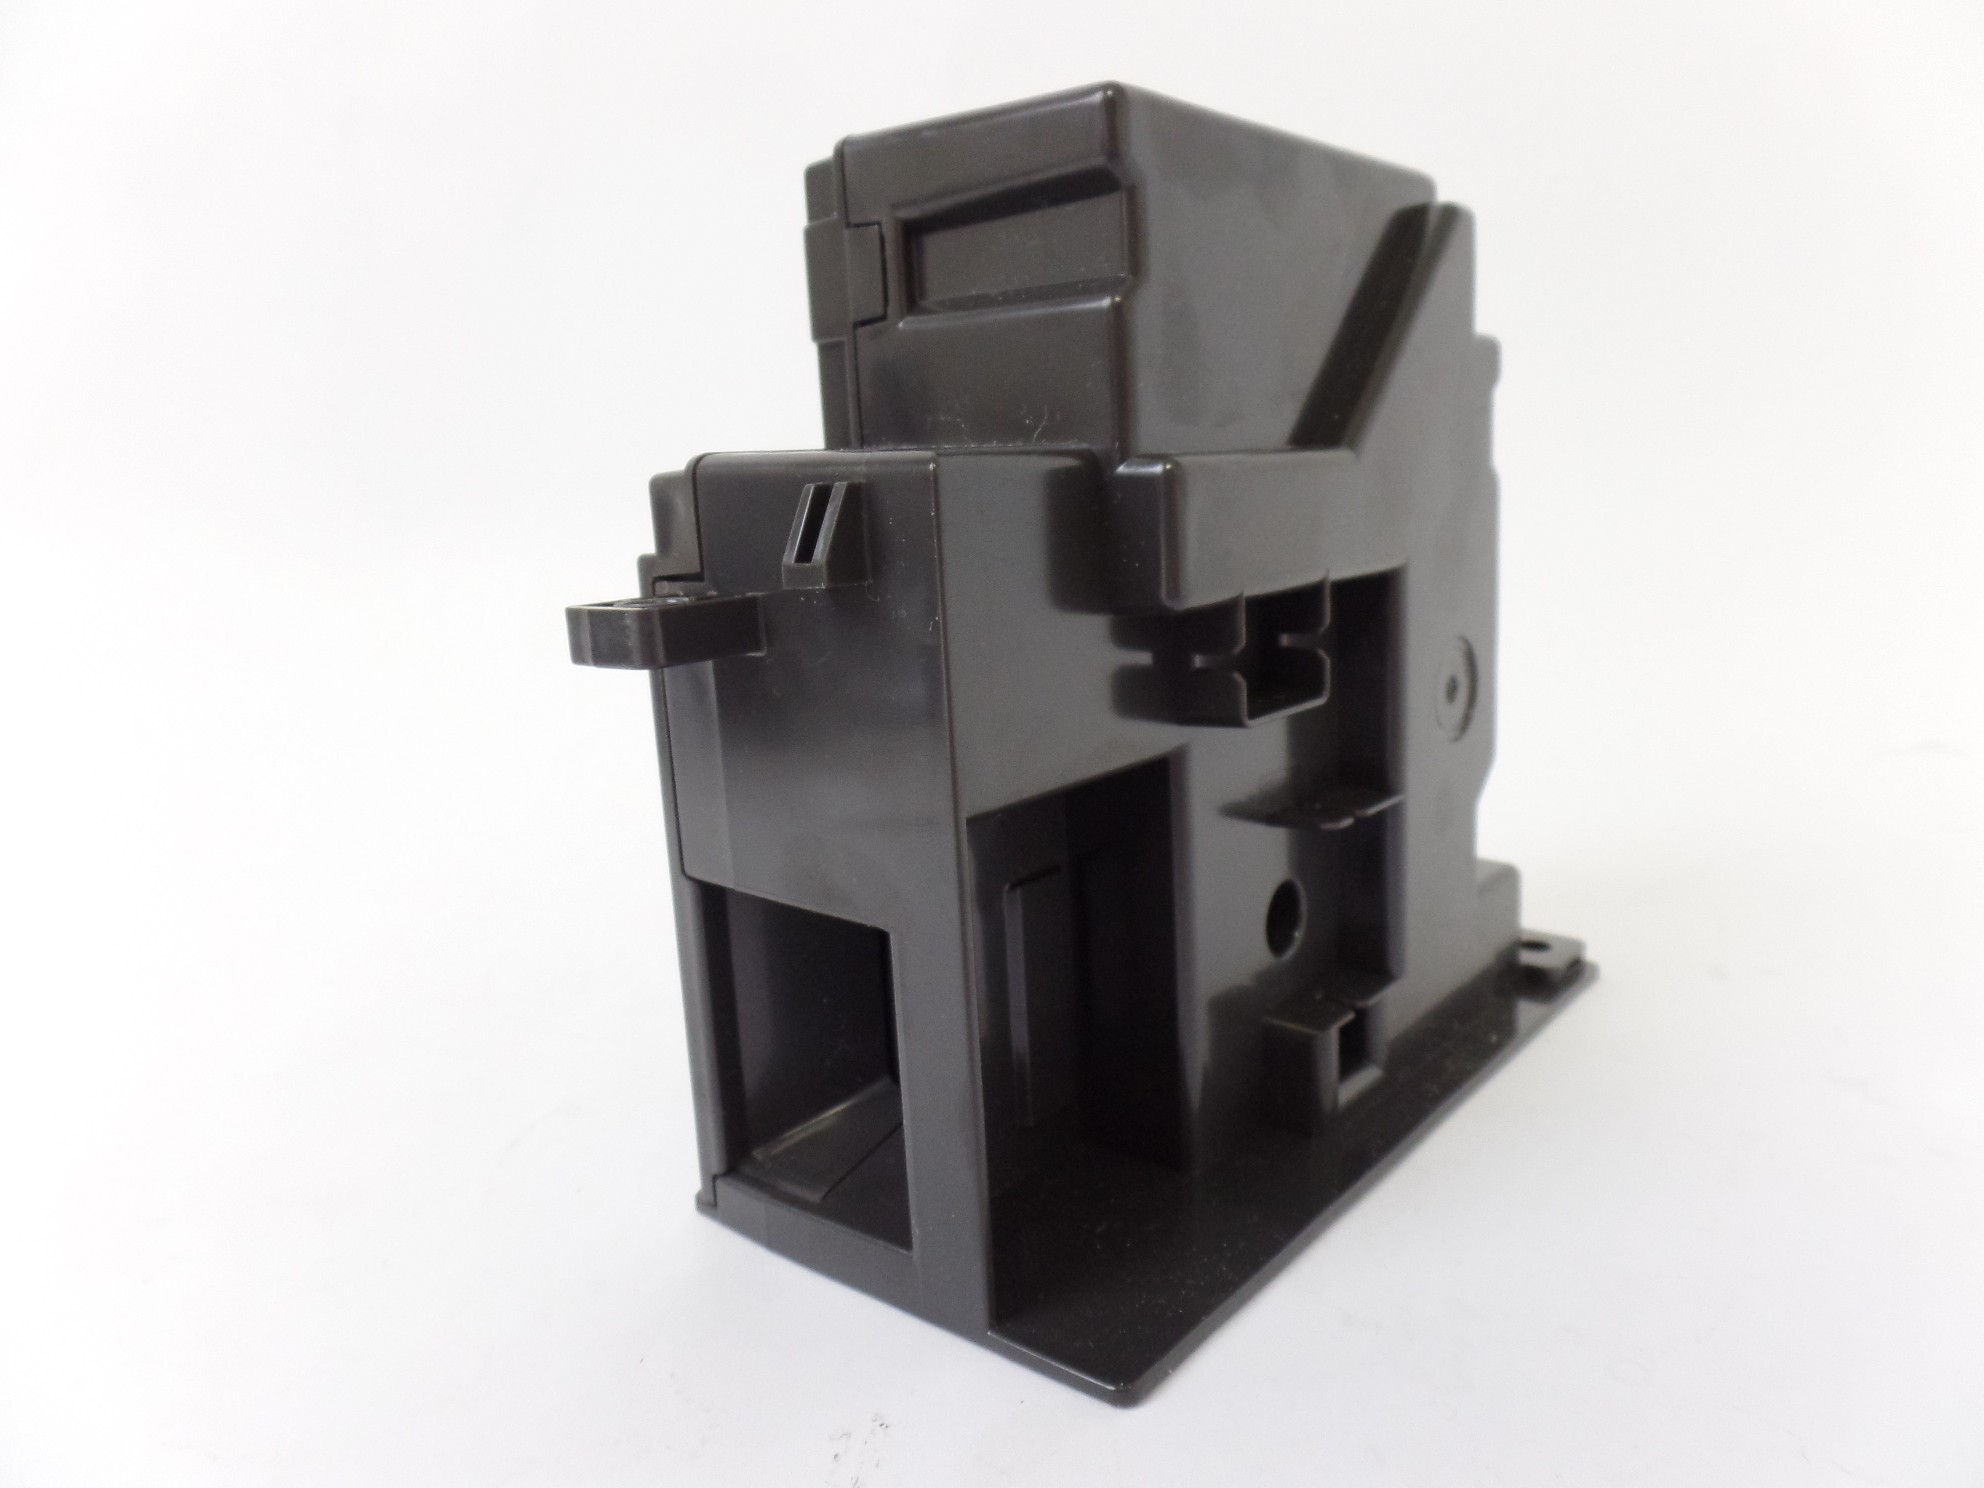 OEM Canon AC Power Adapter K30342 For Canon PIXMA MX432 MX439 MX452 Printer